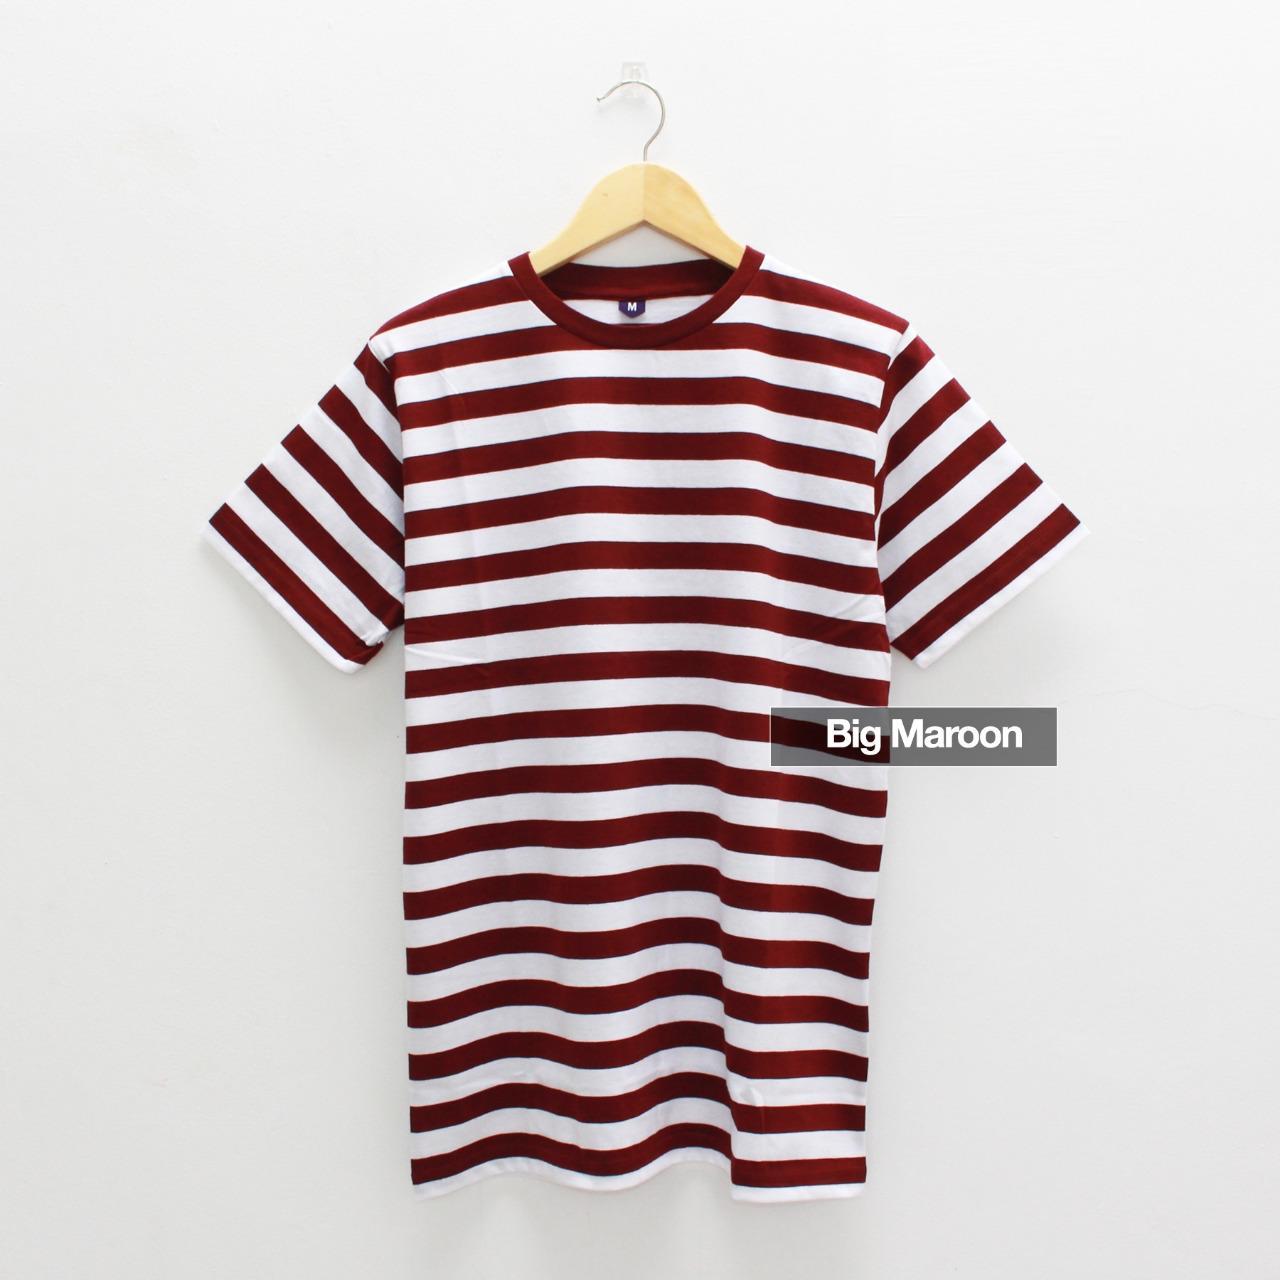 Baju Kaos STRIP BIG MAROON / Kaos Garis Merah Marun / Kaos Salur Tangan / Lengan Pendek Pria Wanita